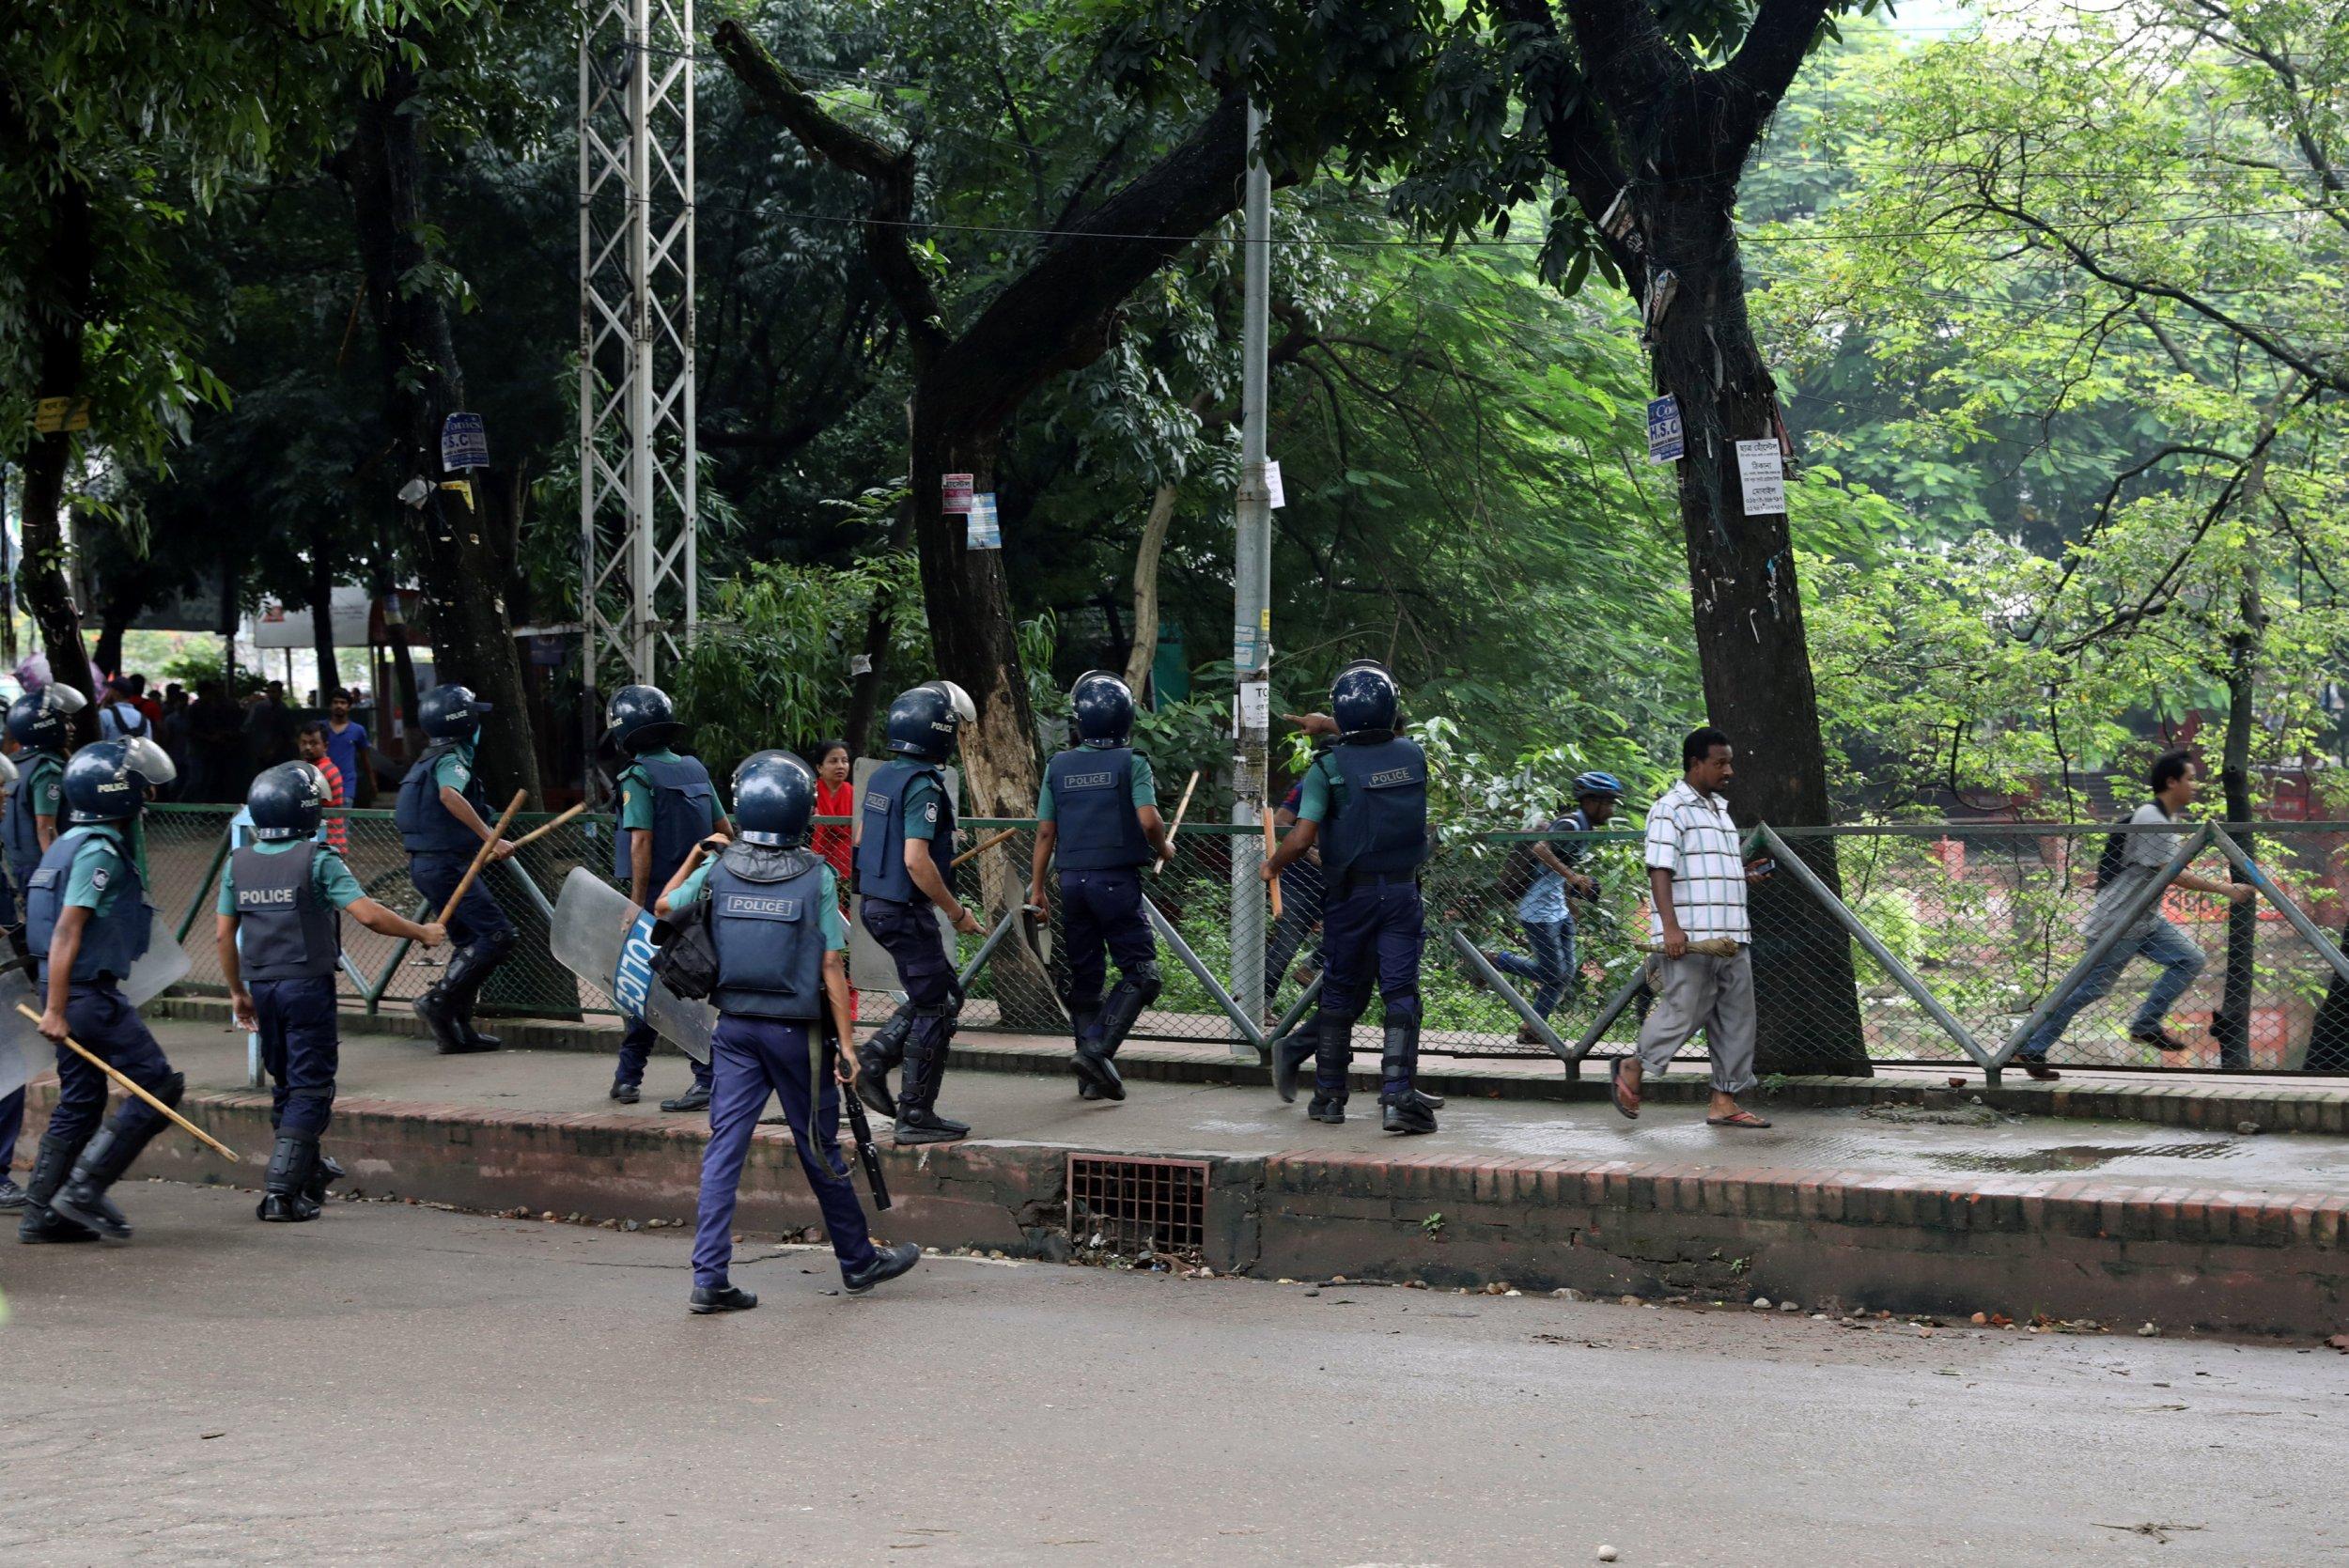 2018-08-05T115915Z_1_LYNXMPEE7408W_RTROPTP_4_BANGLADESH-PROTEST